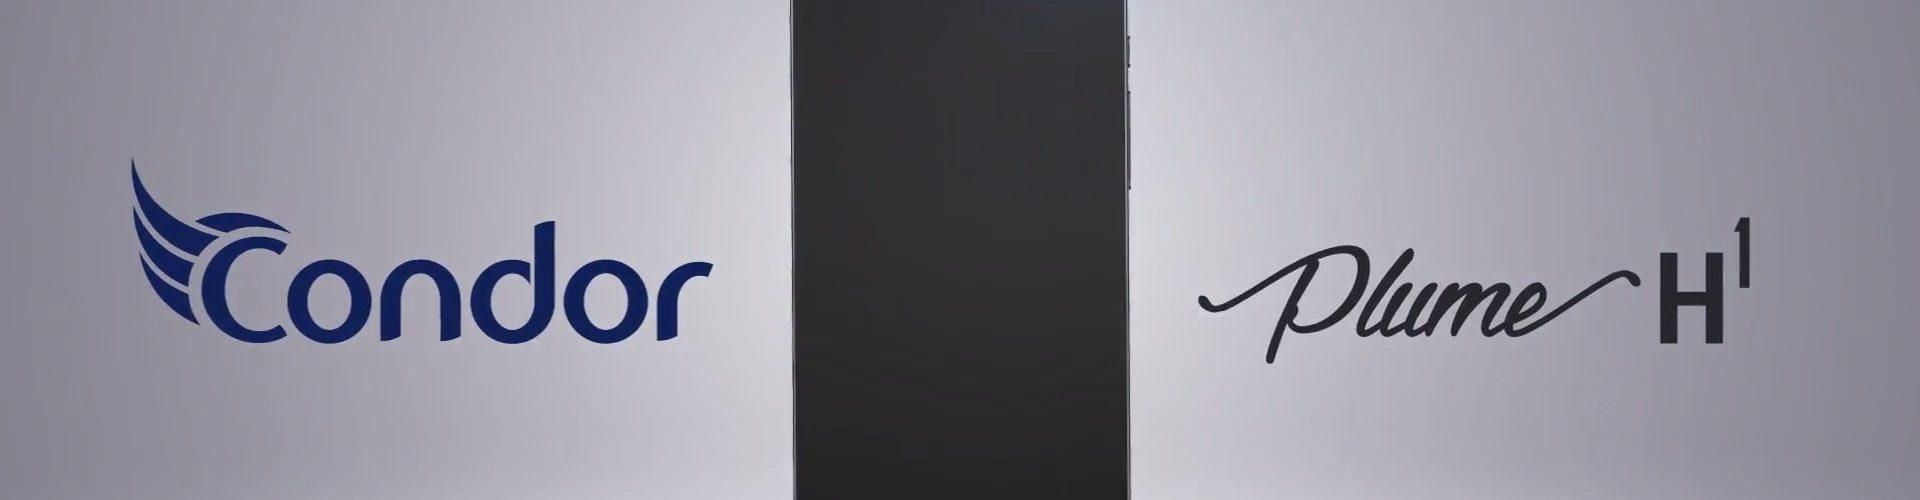 سعر ومواصفات هاتف كوندور الجديد Plume H1 - بليم أش 1